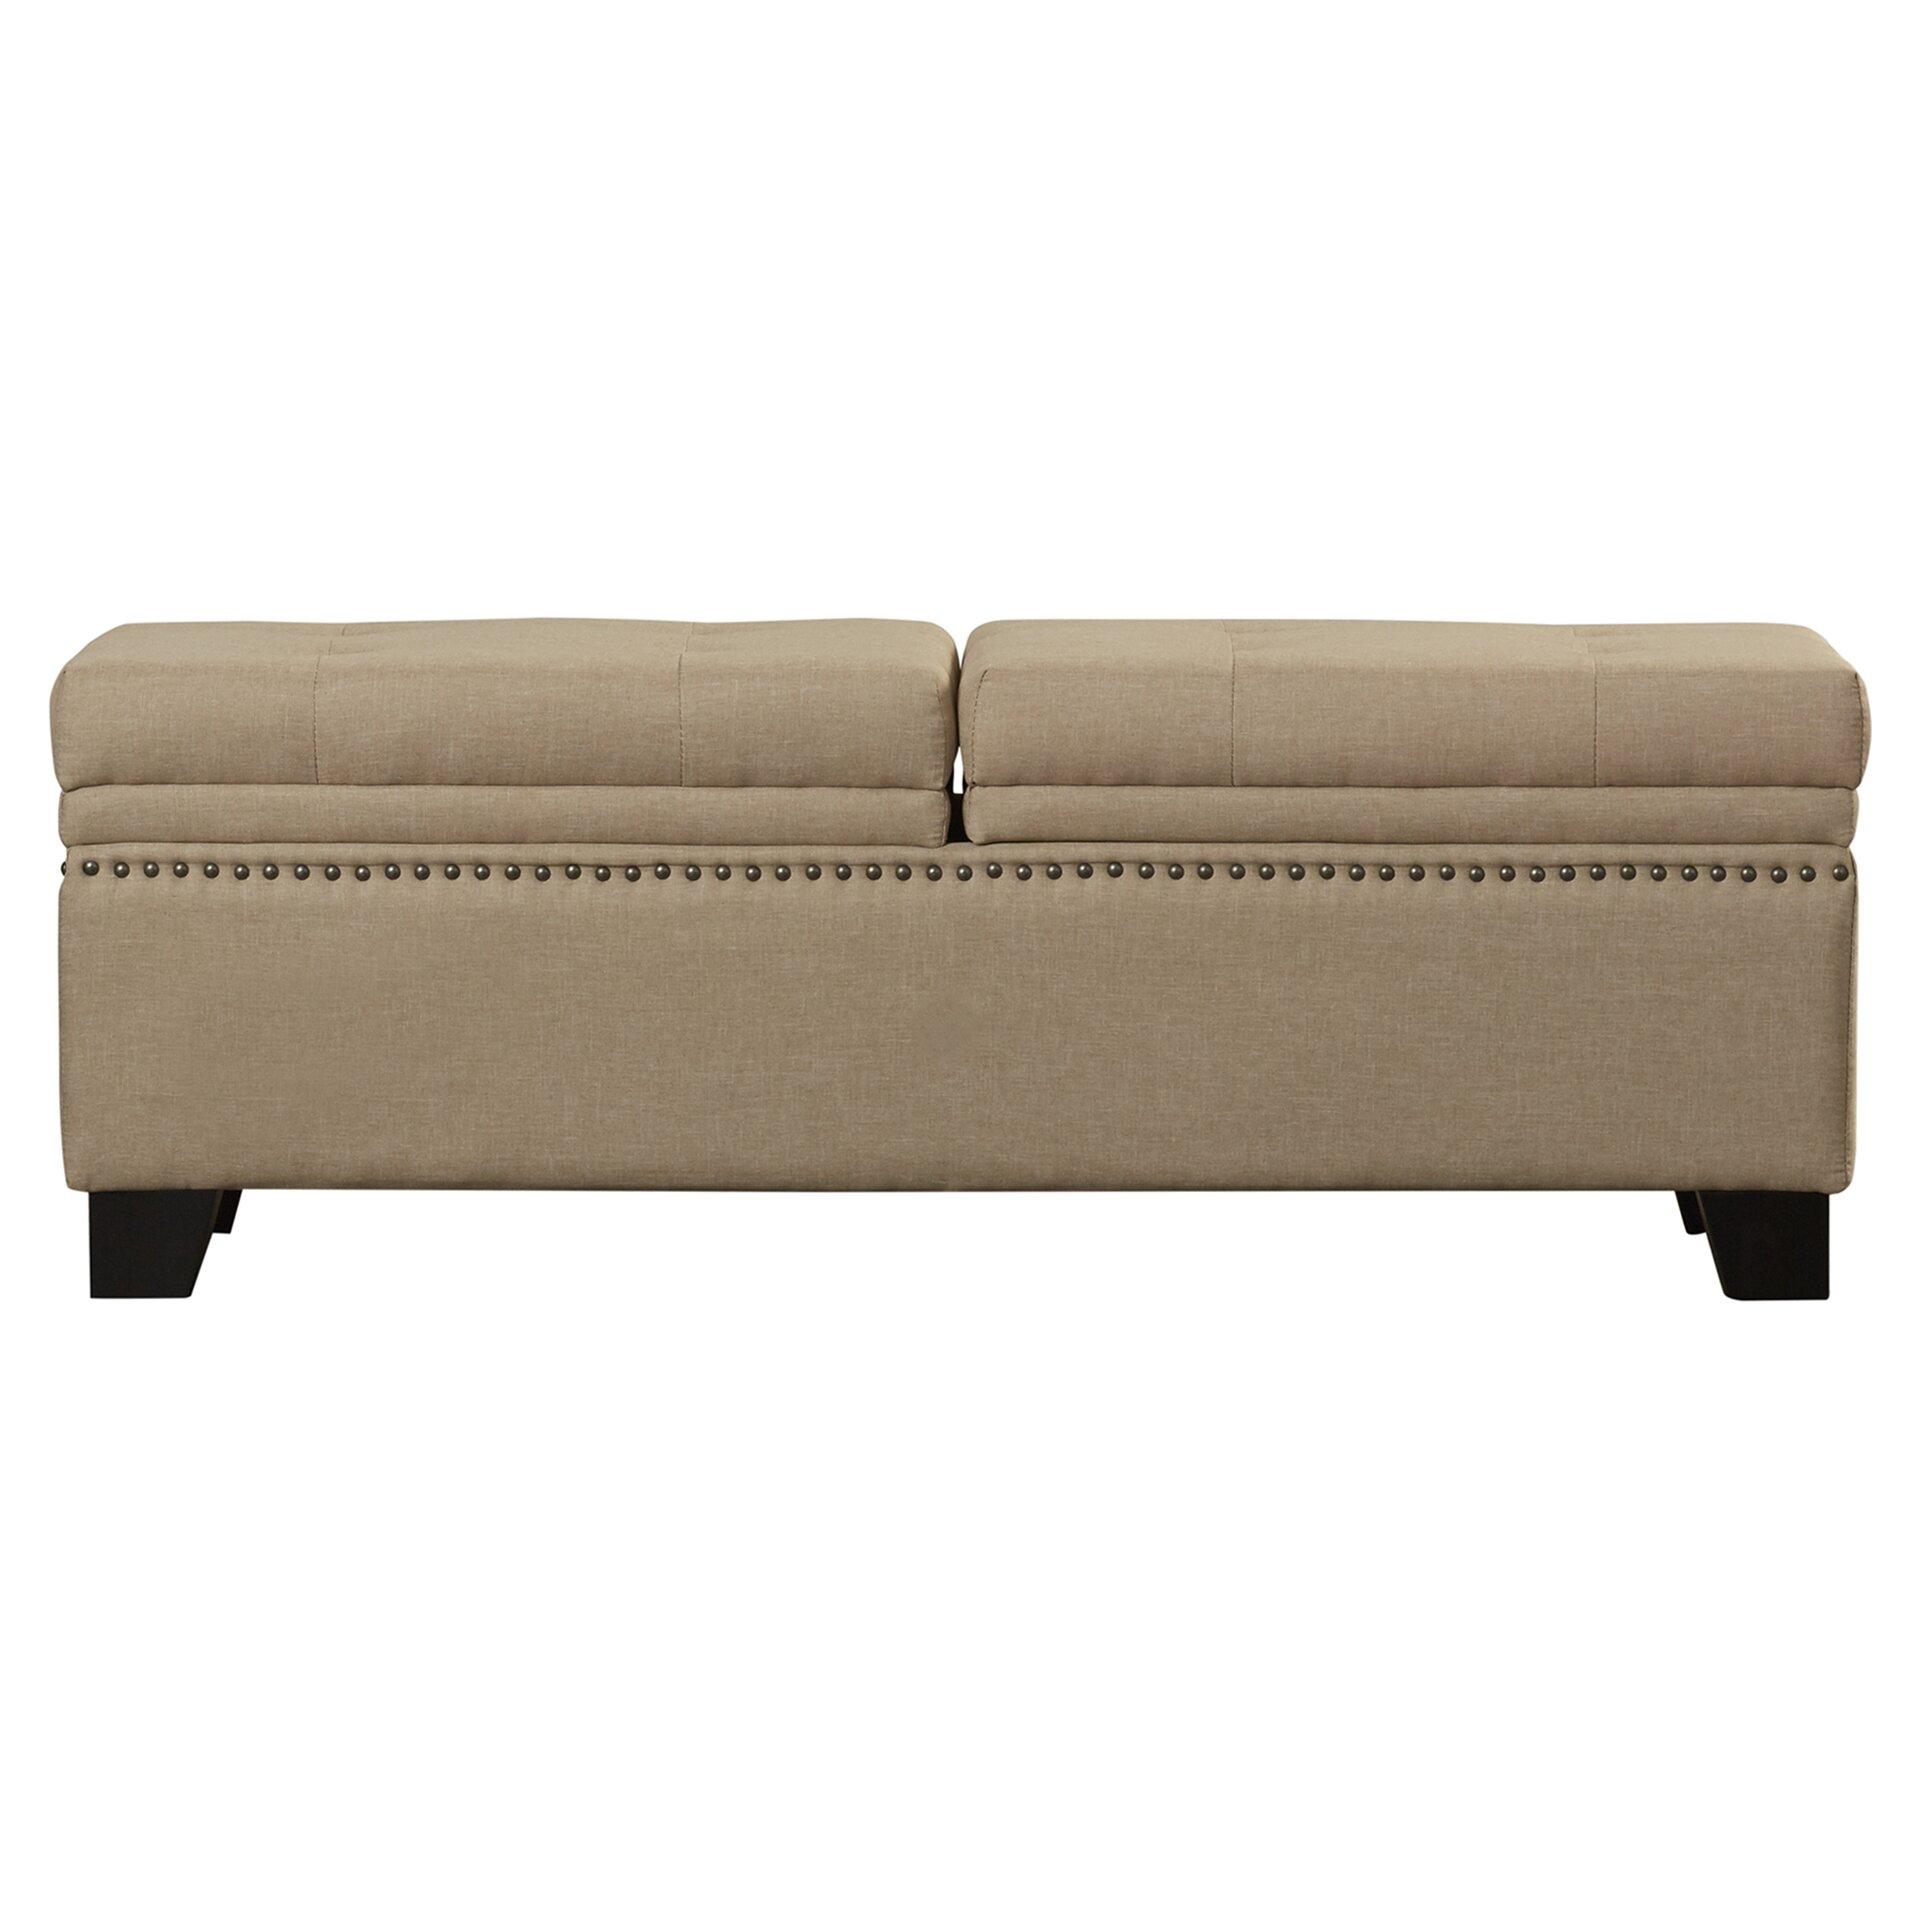 Bedroom benches with storage - Storage Bedroom Benches Bedroom Seating Bench Comfort Design